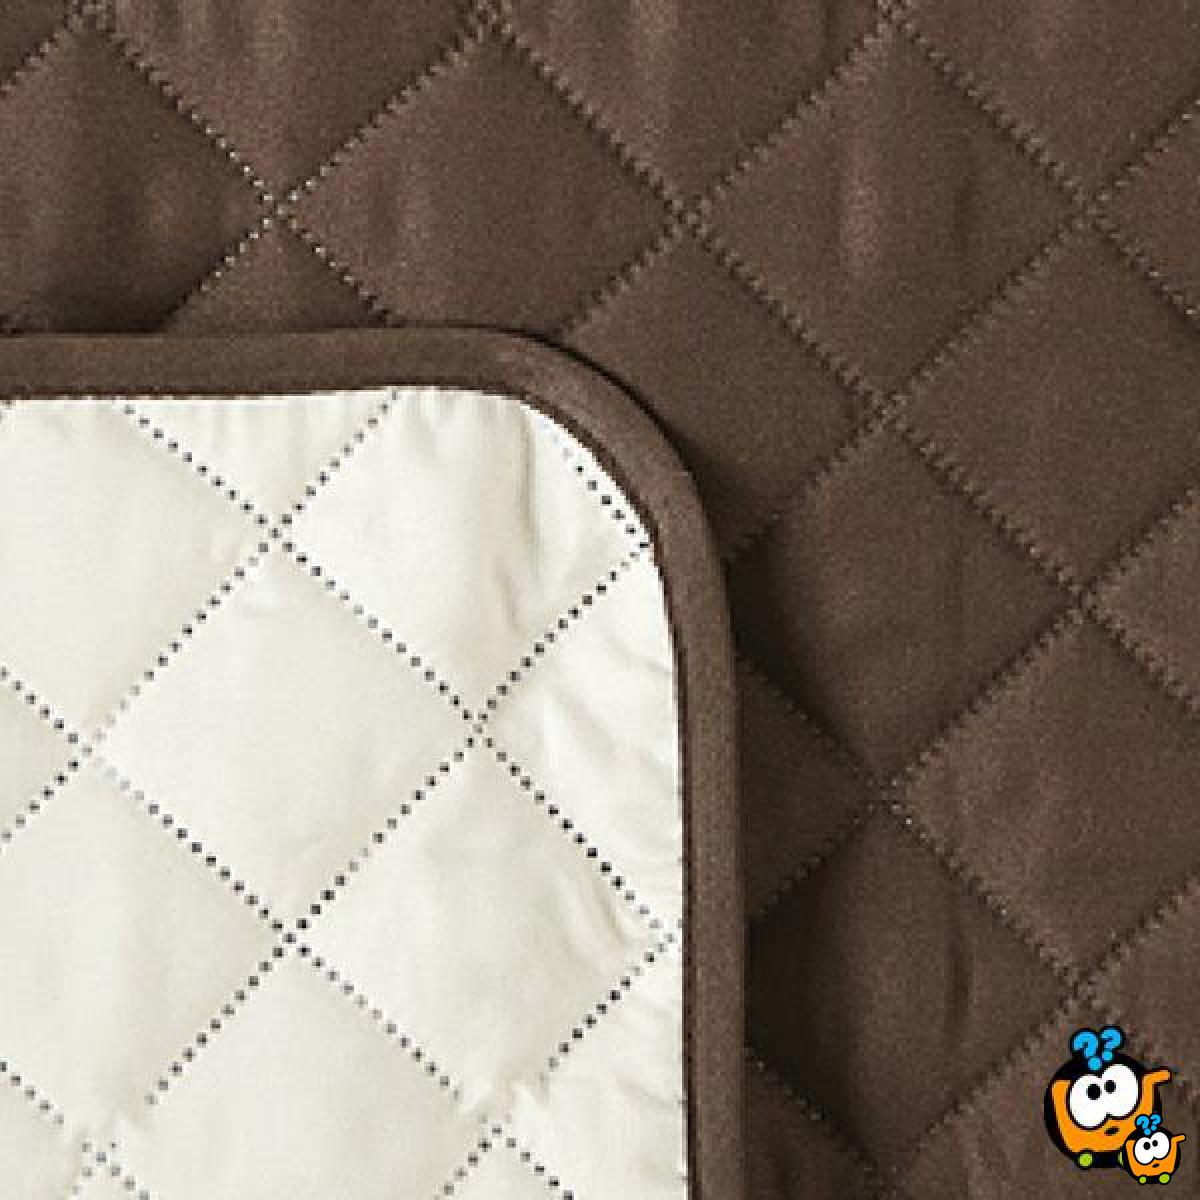 Couch Coat  - Specijalni prekrivač za dvosede